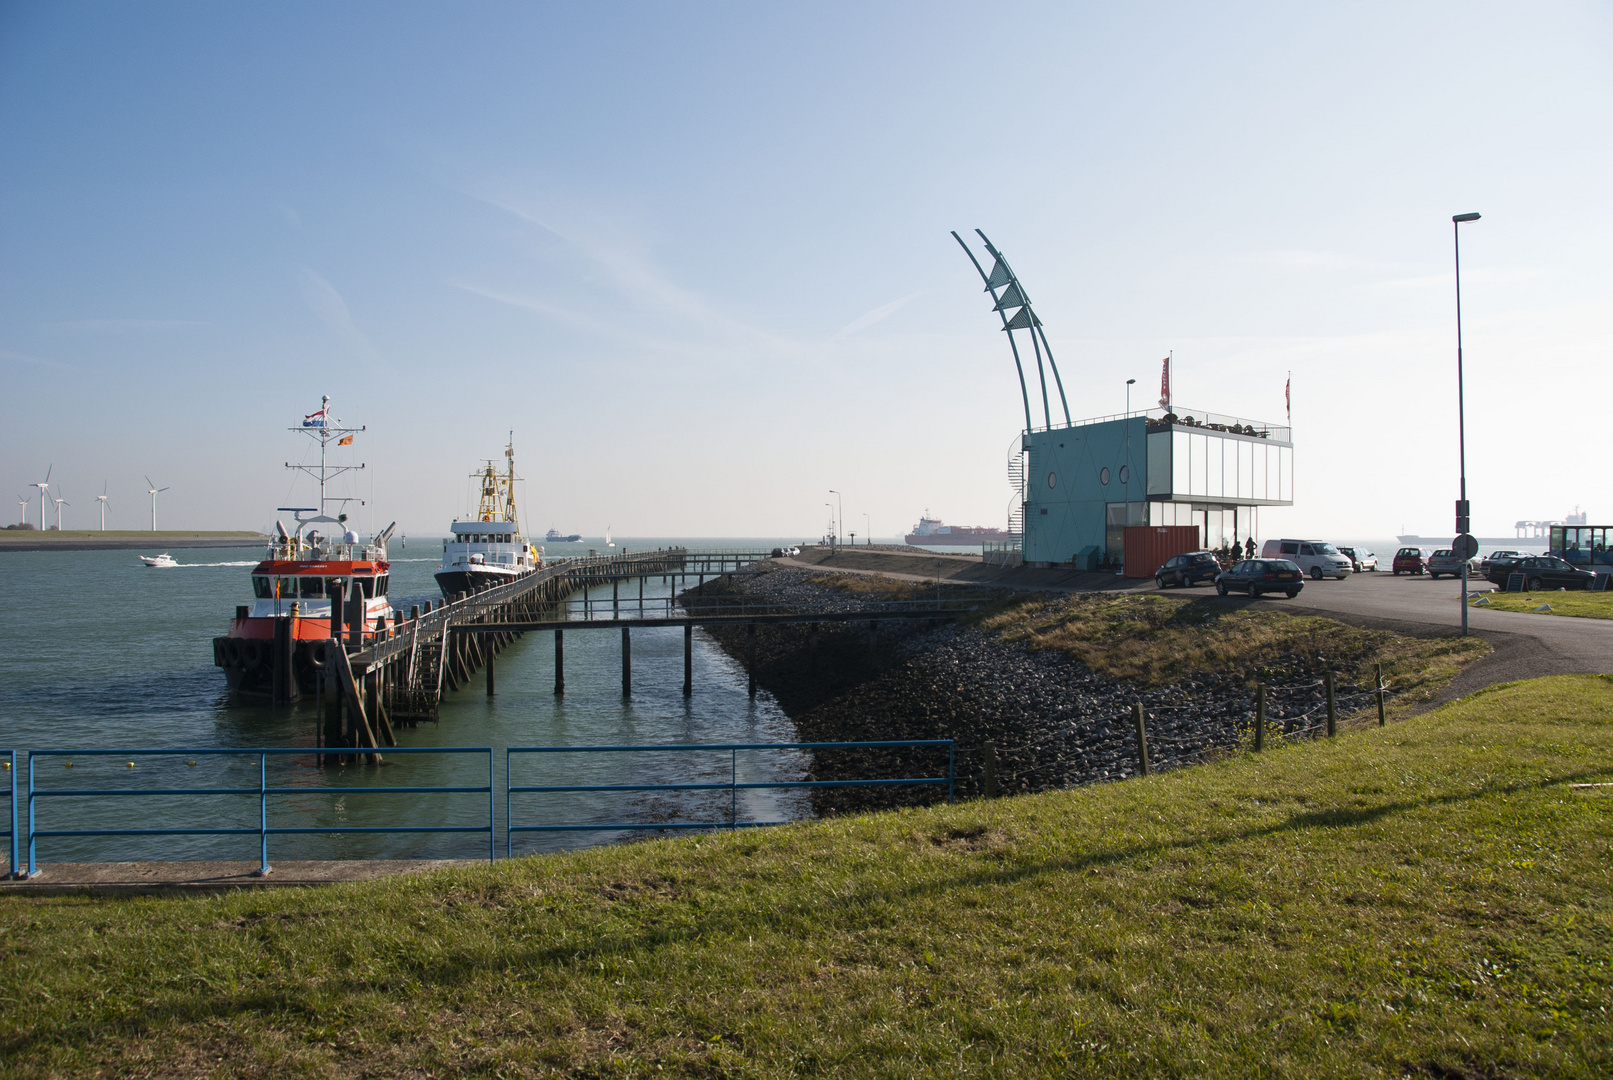 Vlissingen - Piet Heinkade